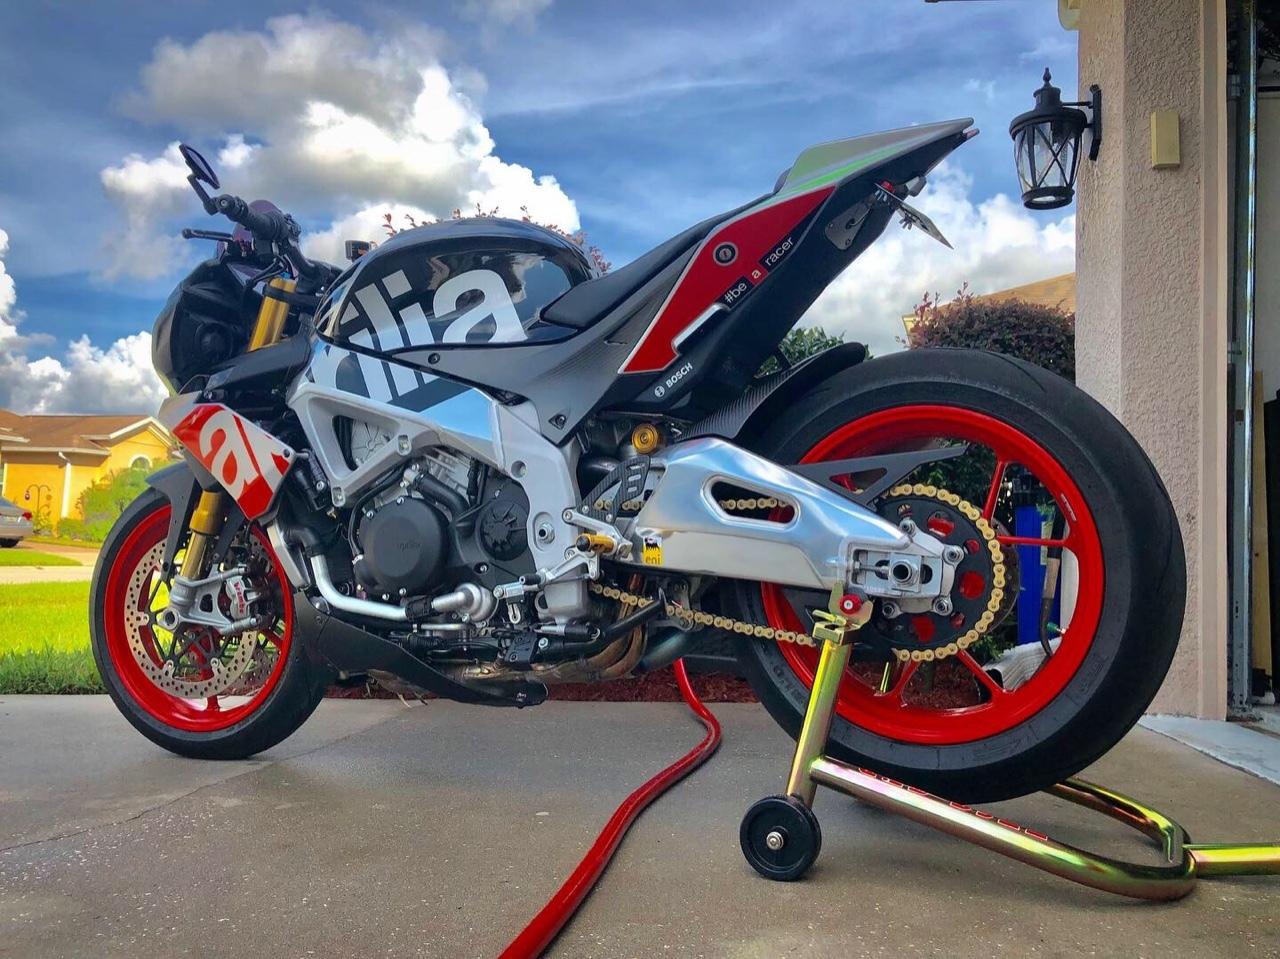 Tuono For Sale - Aprilia Motorcycles - Cycle Trader